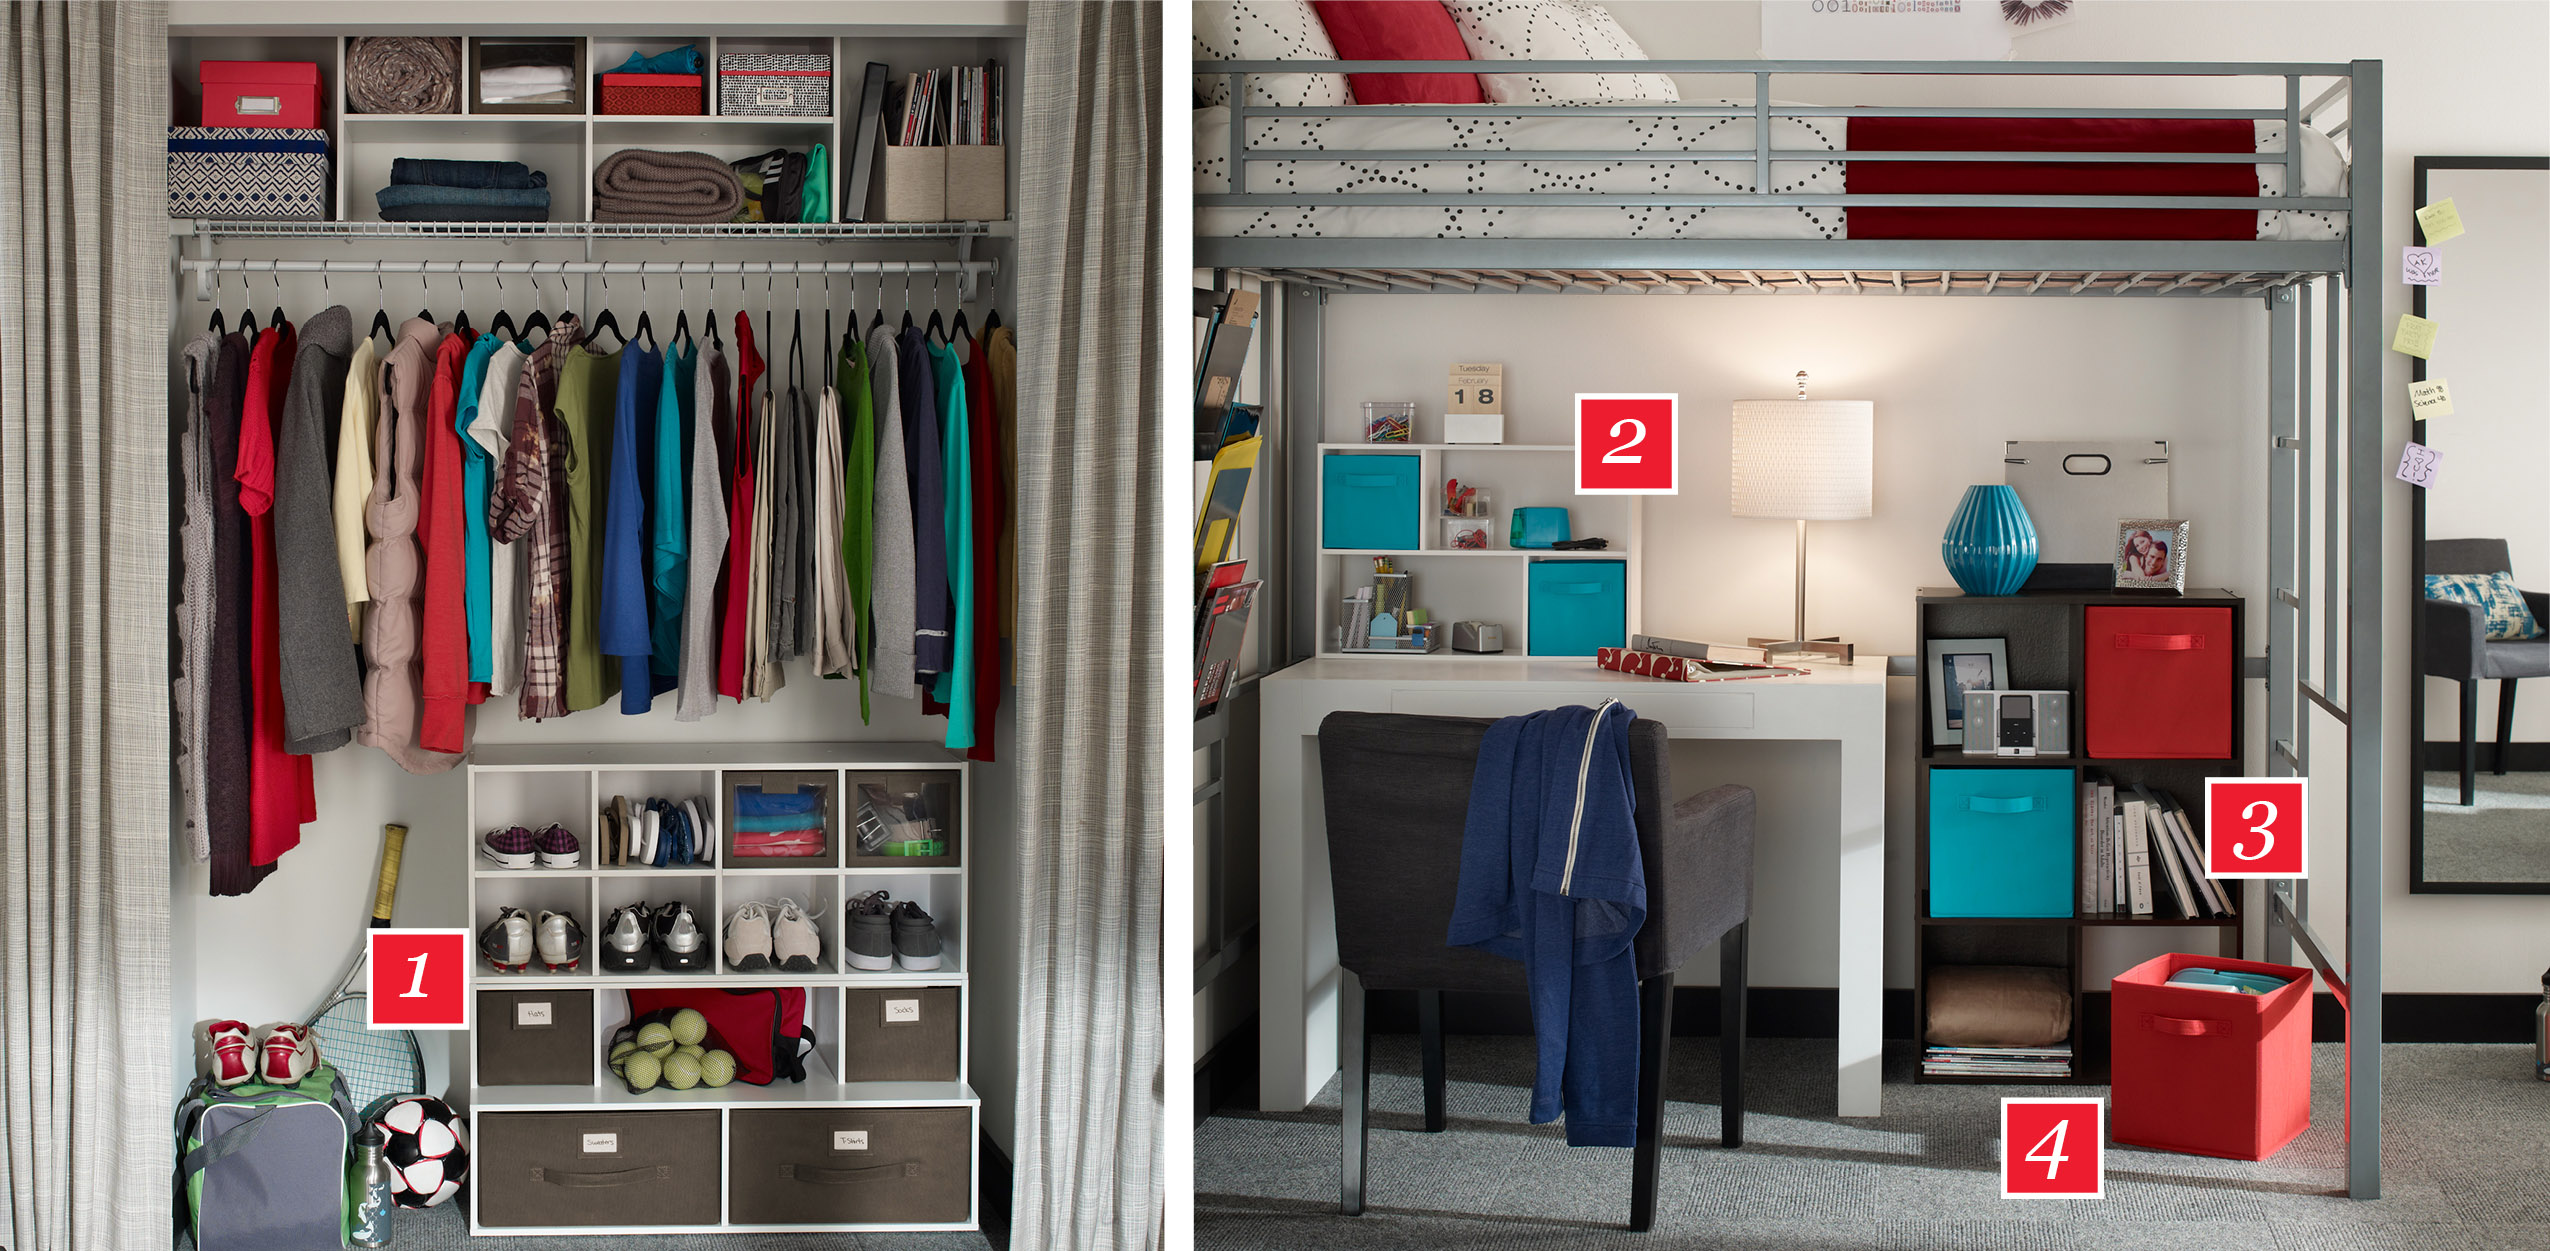 dorm room storage ideas - Closetmaid Design Ideas